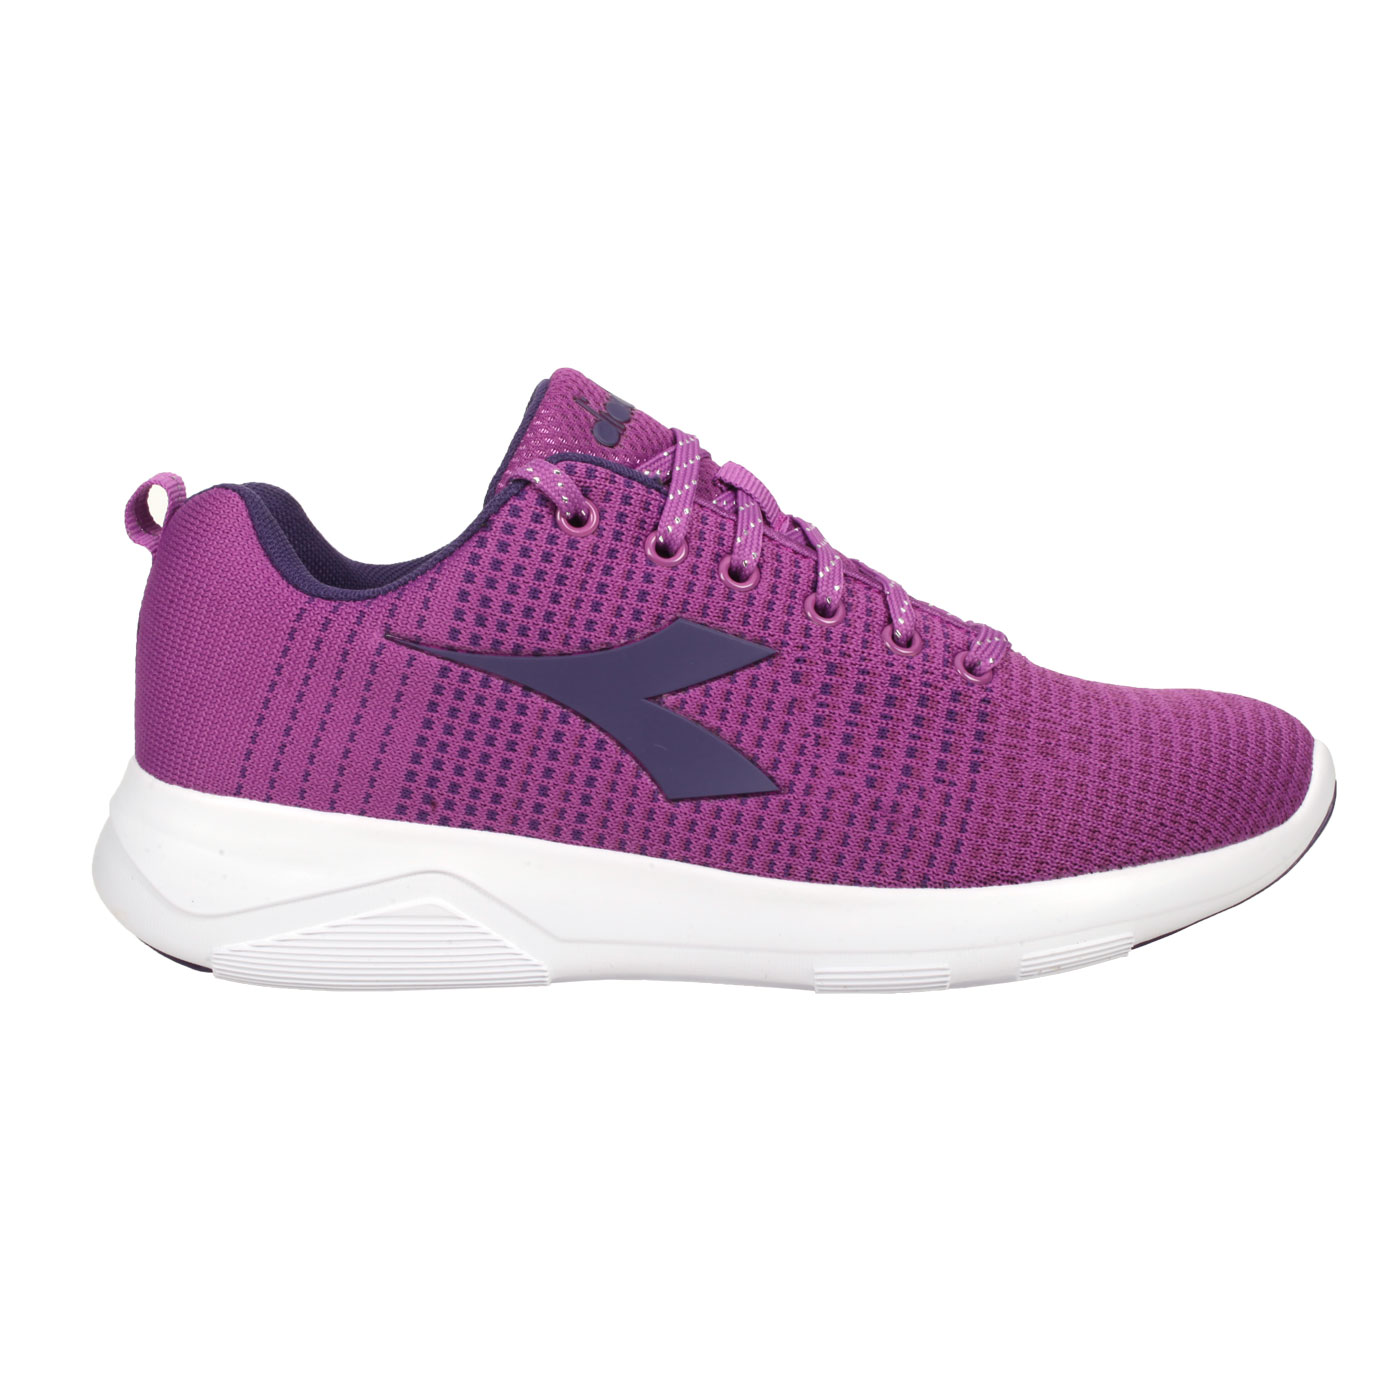 DIADORA 女款進口慢跑鞋 DA175609-C8905 - 紫